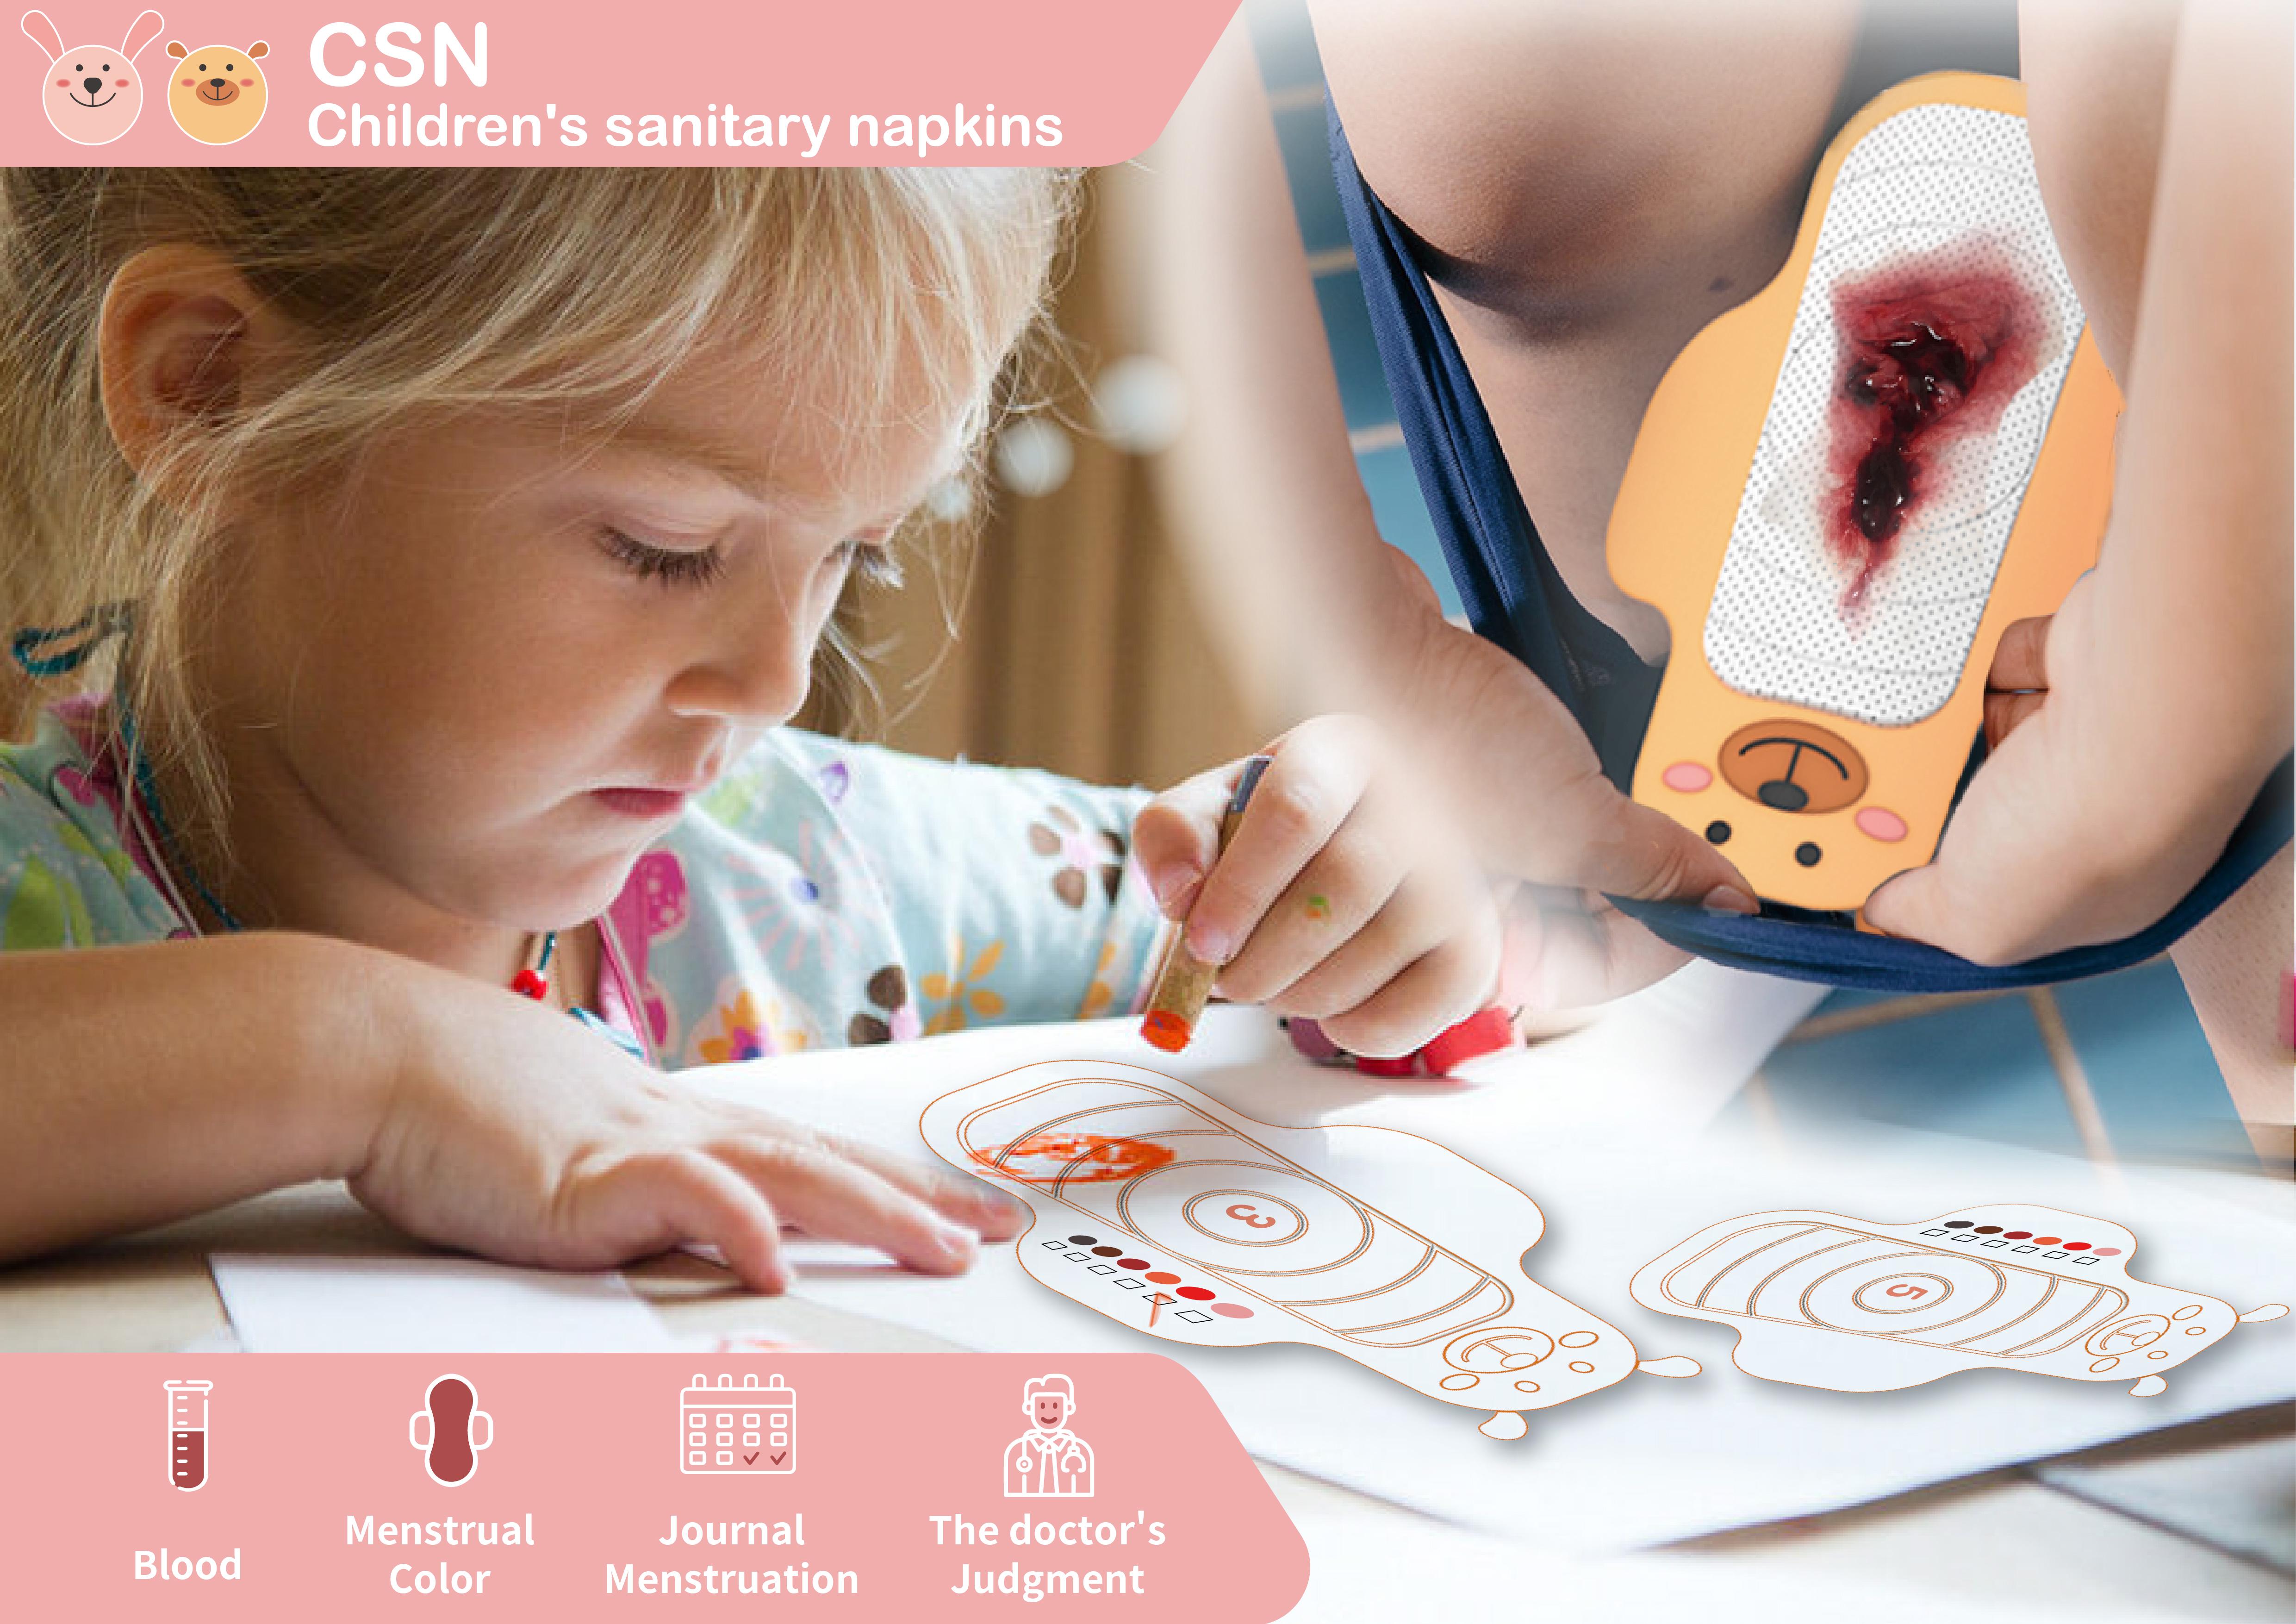 CSN-Children's sanitary napkins